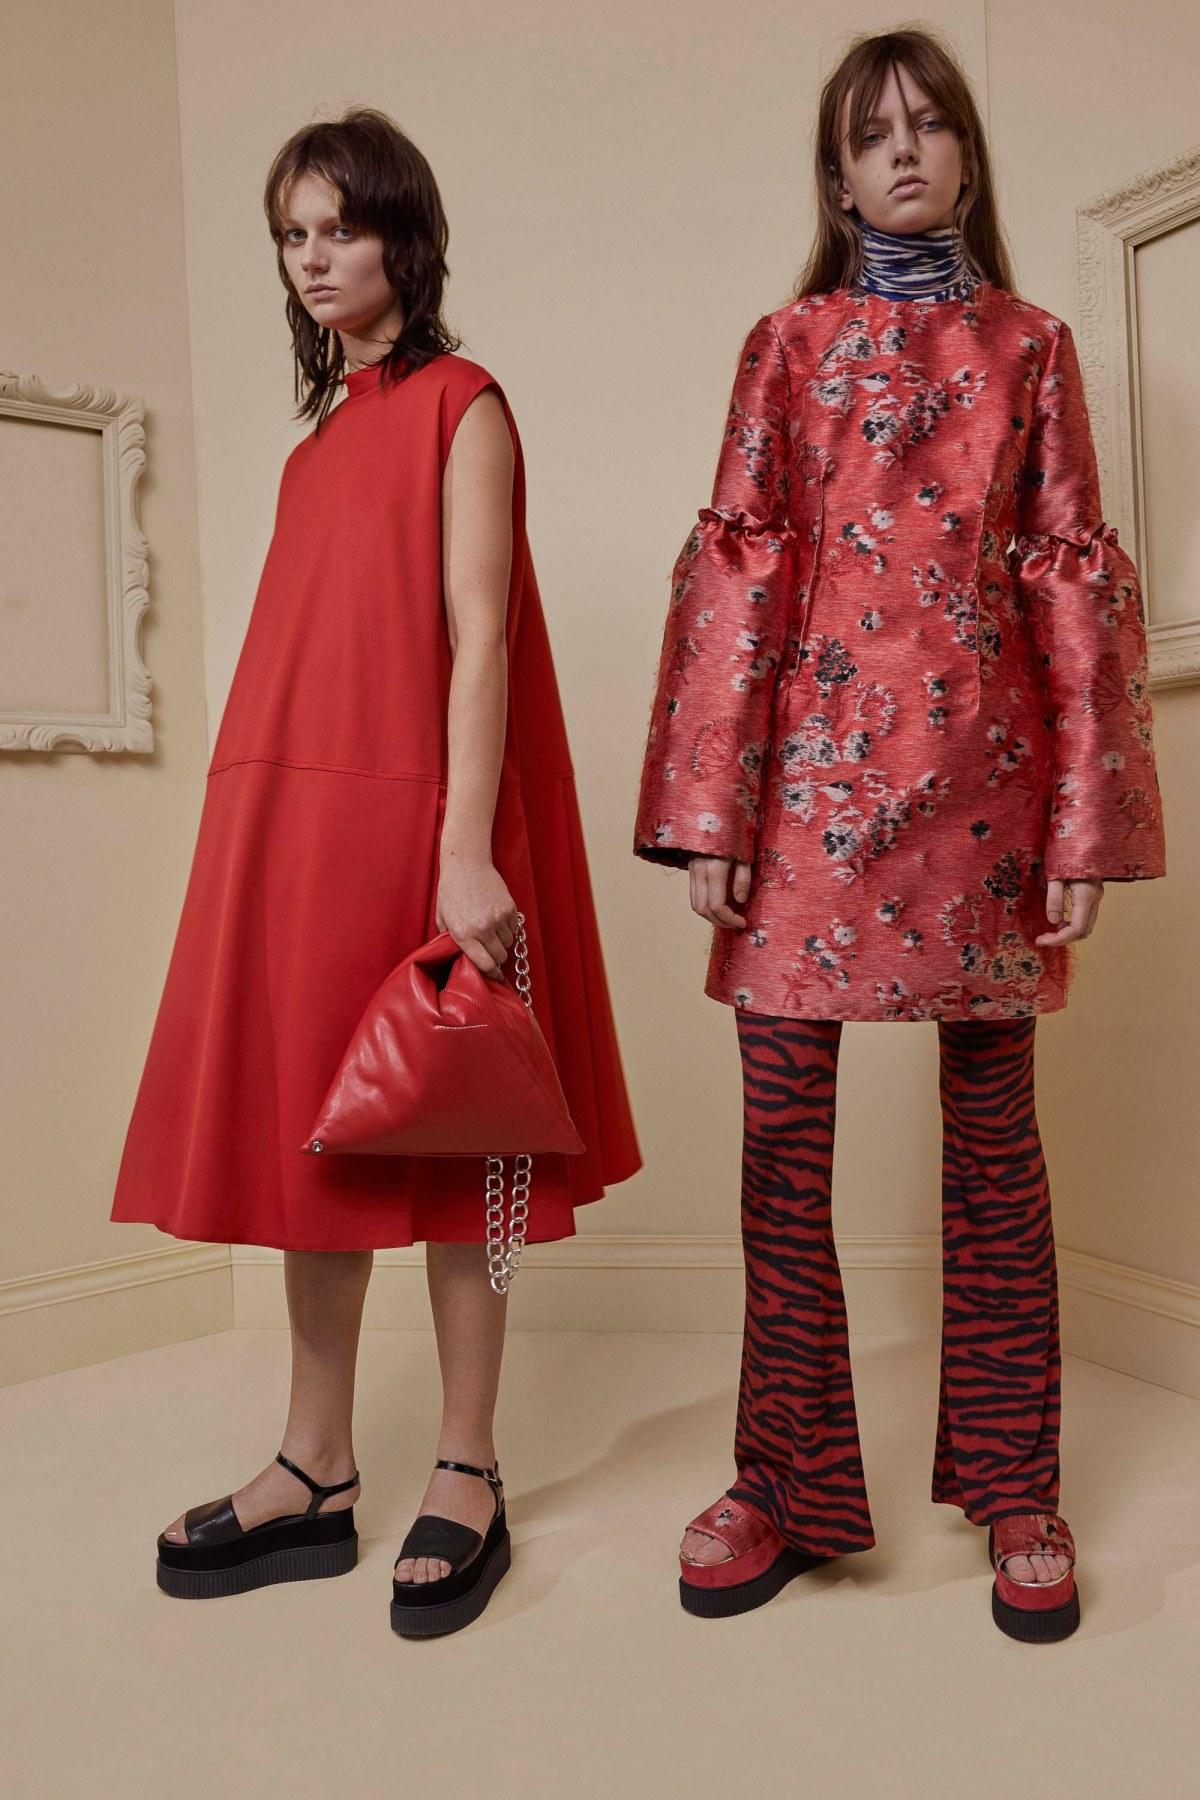 mm6-maison-margiela-pre-fall-2017-fashion-show-the-impression-14